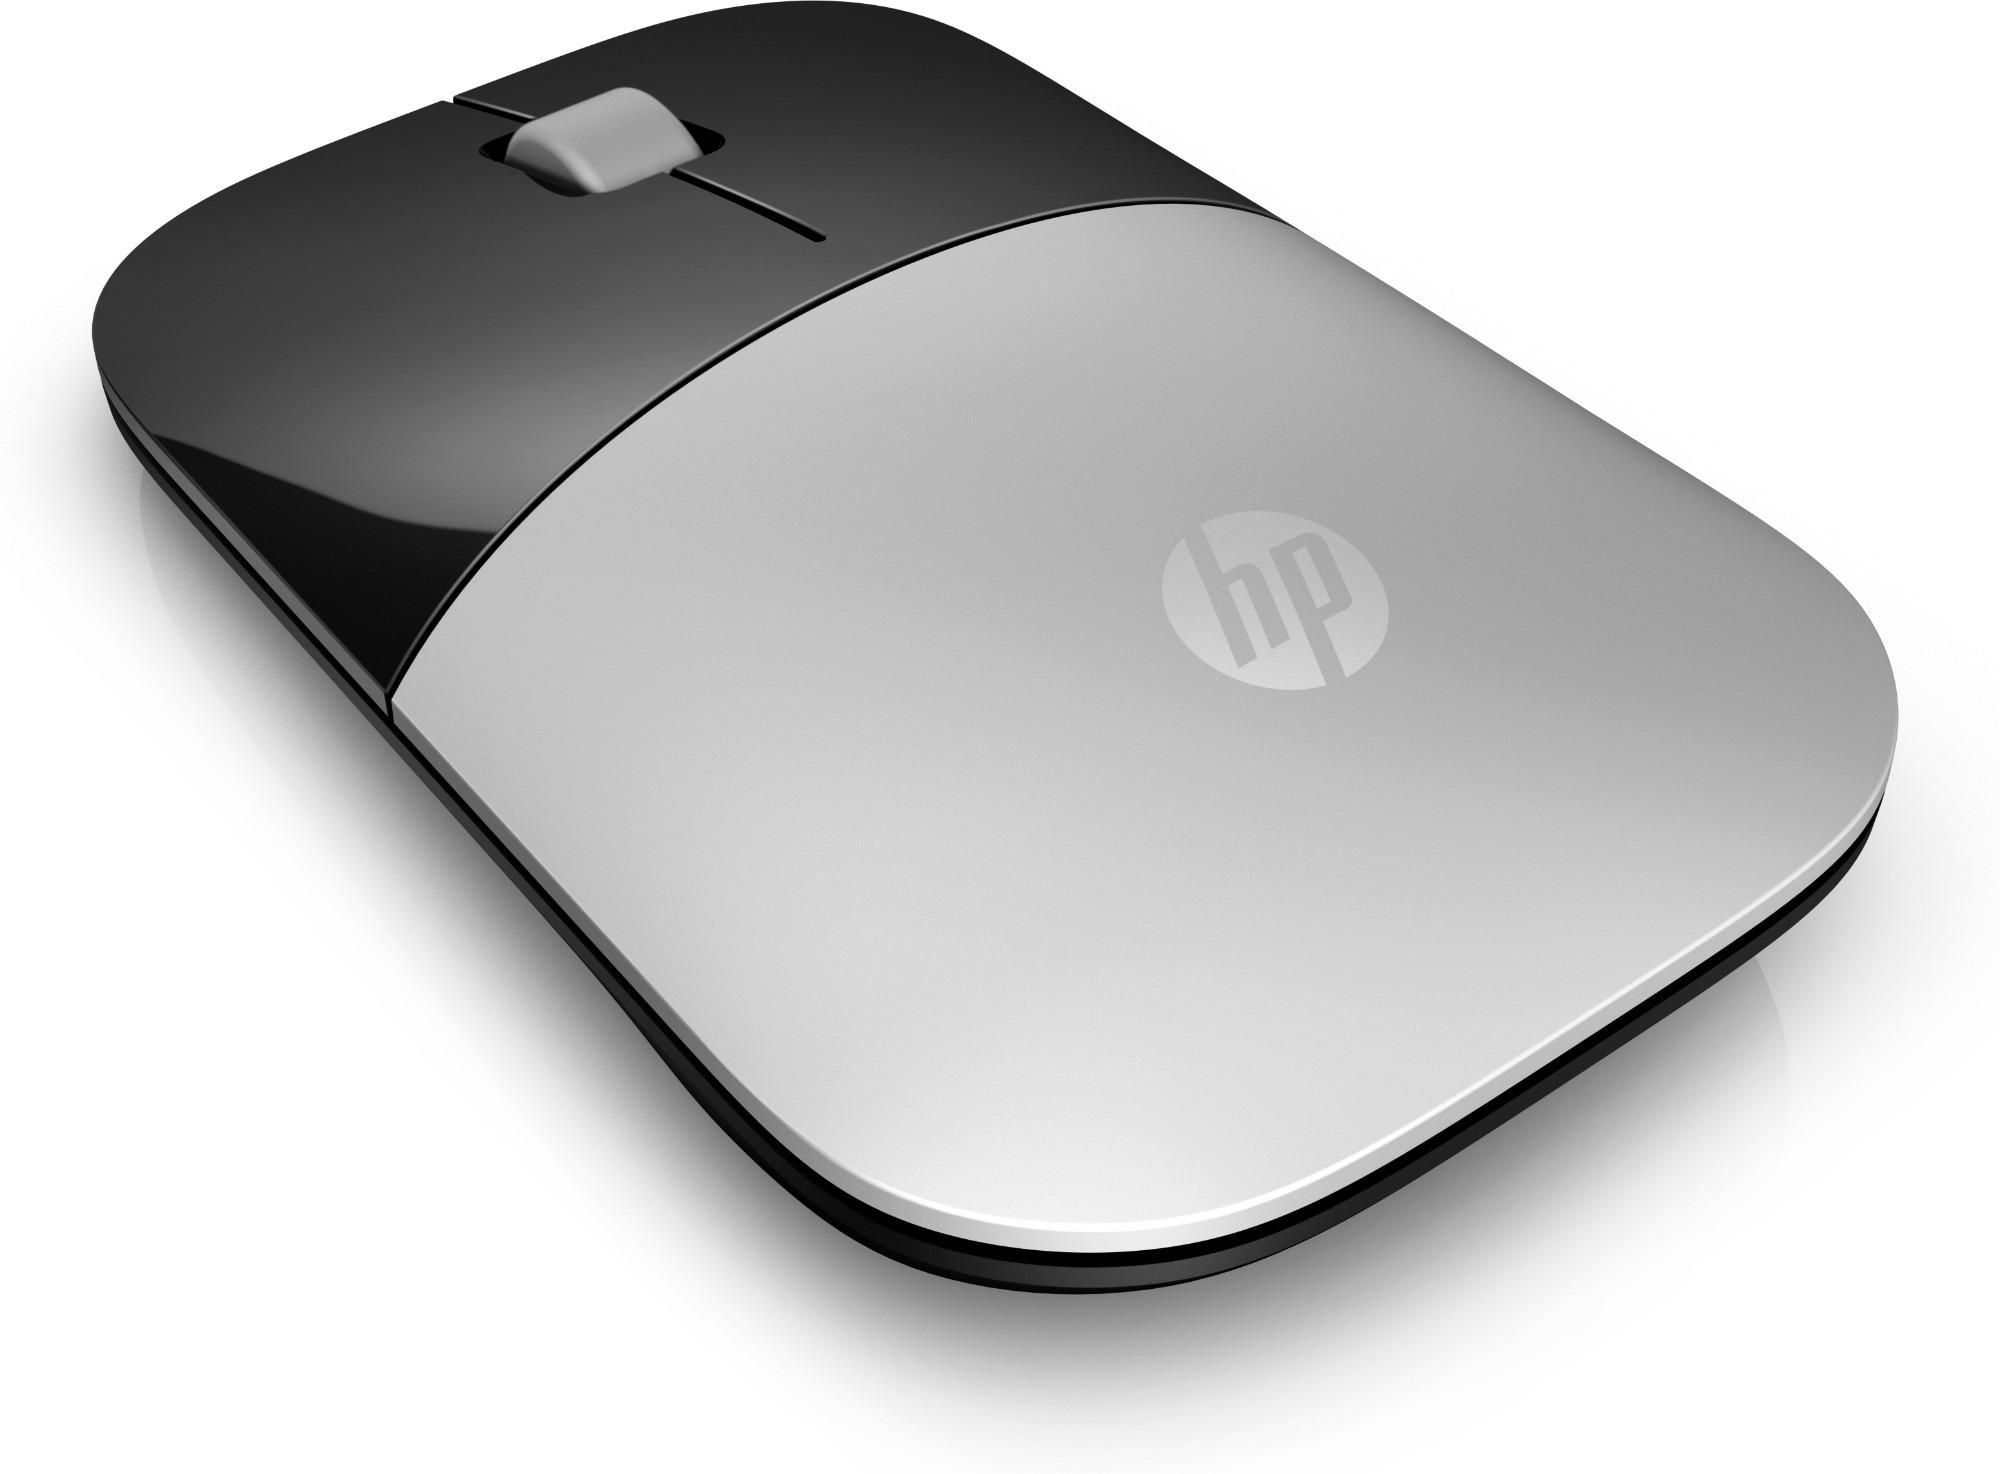 HP Z3700 mouse RF Wireless Optical 1200 DPI Ambidextrous